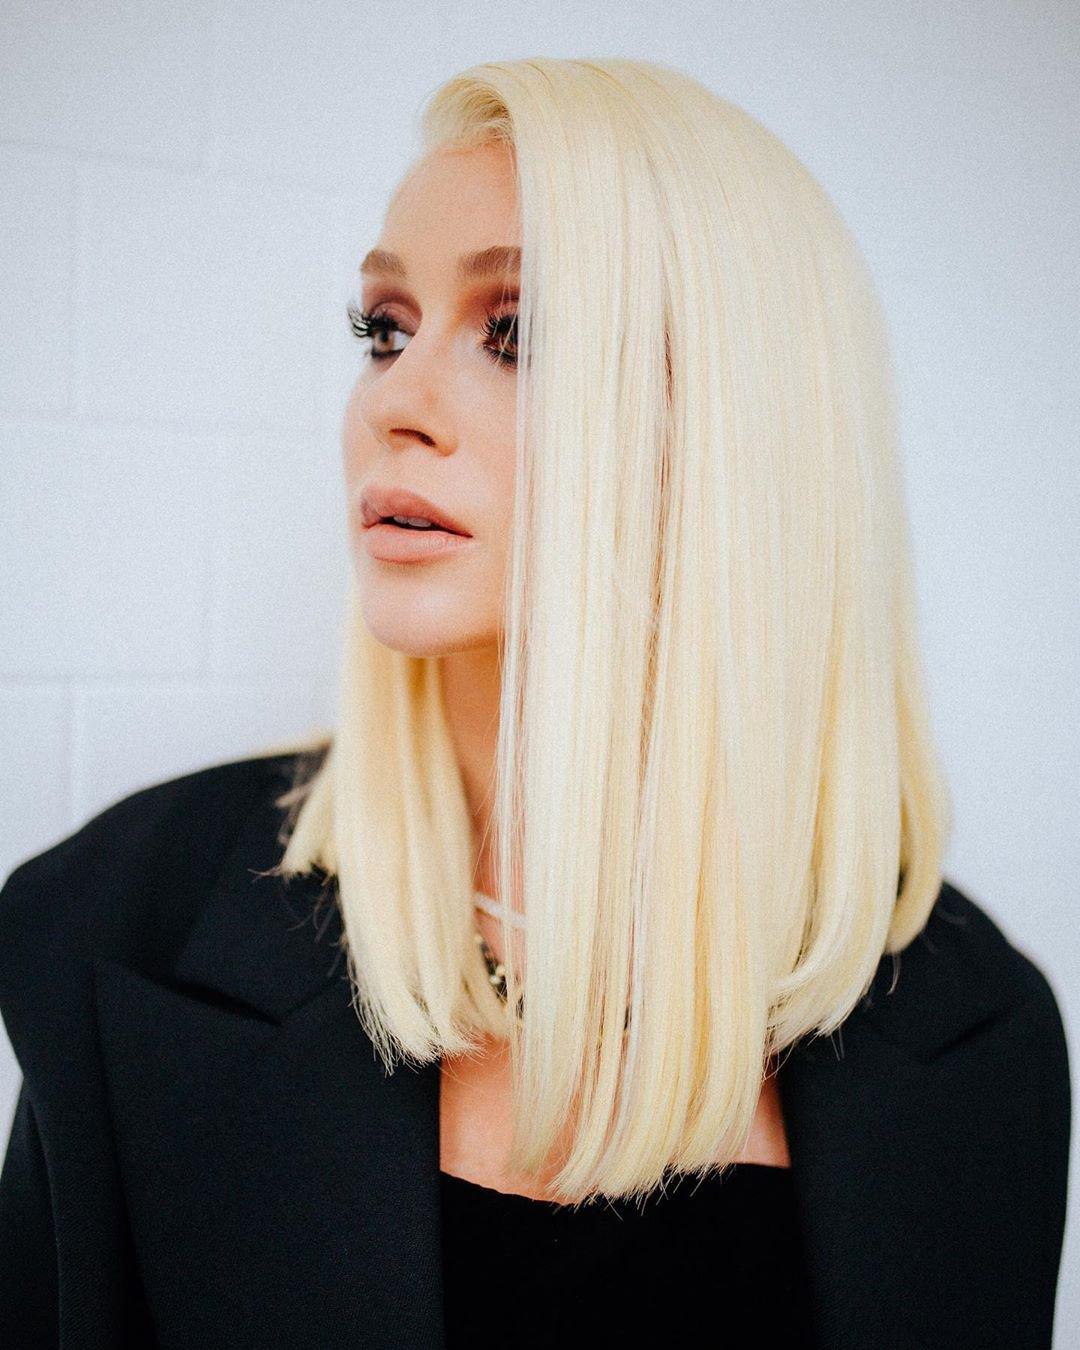 Marina Ruy Barbosa - Cabelo loiro - cabelo platinado - pintou - cabelo Loiro